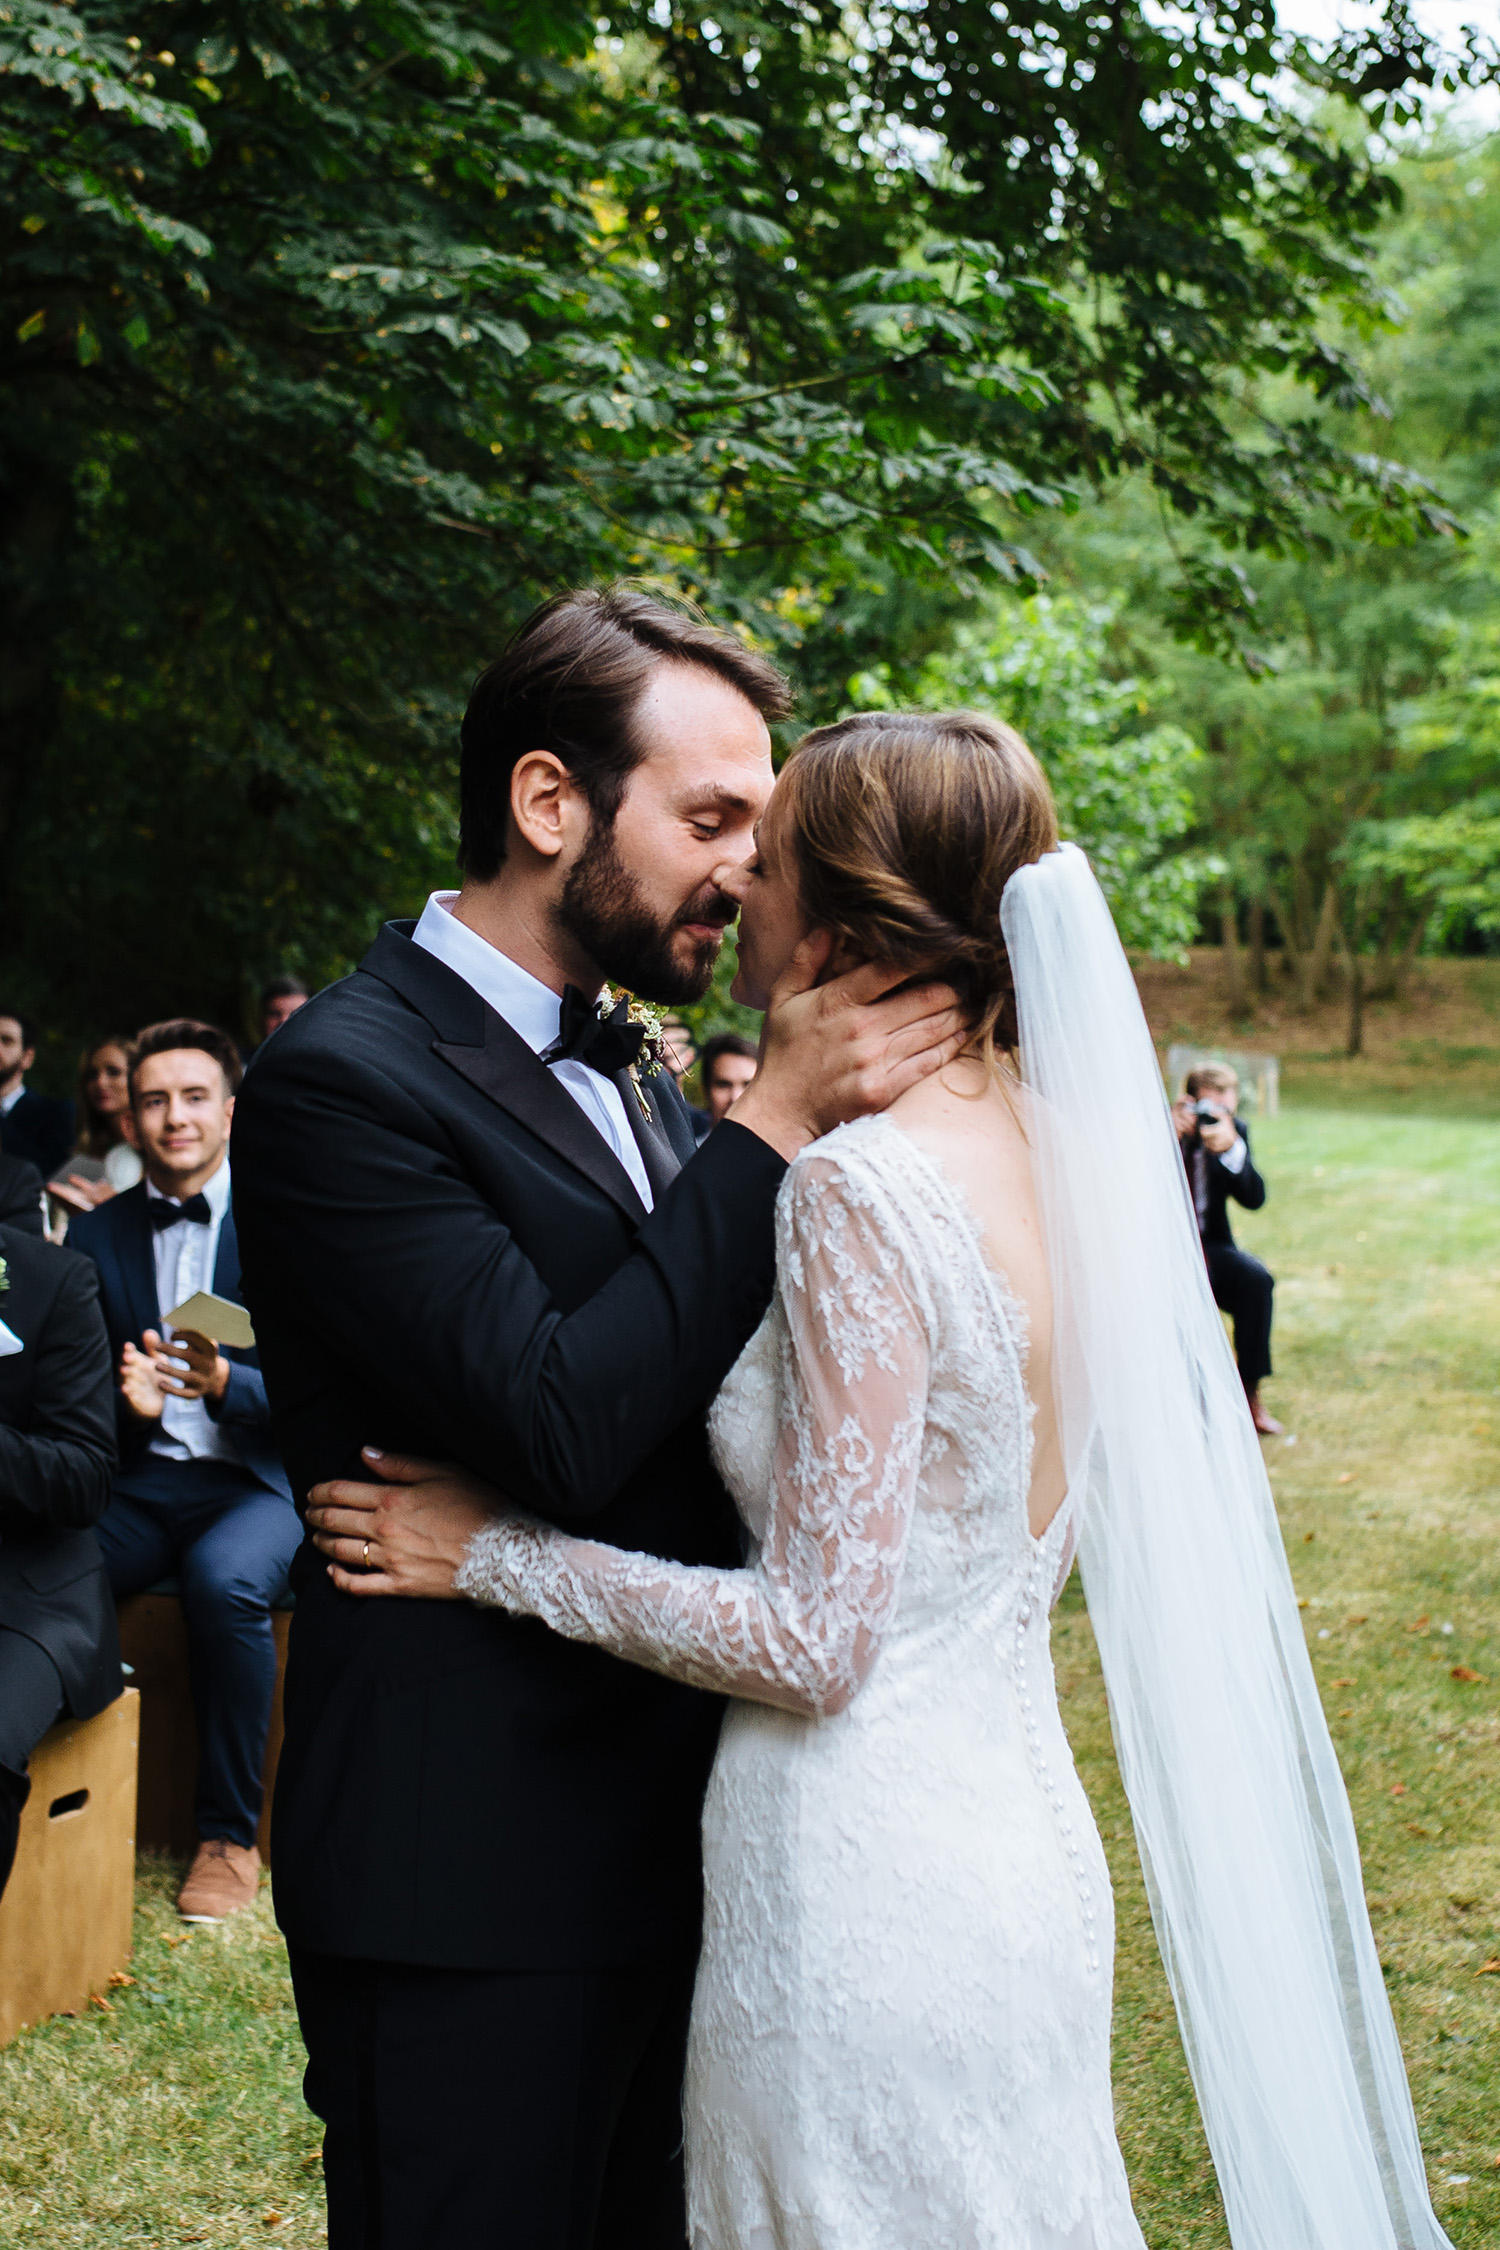 CHILDERLEY HALL CAMBRIDGE WEDDING 47.JPG